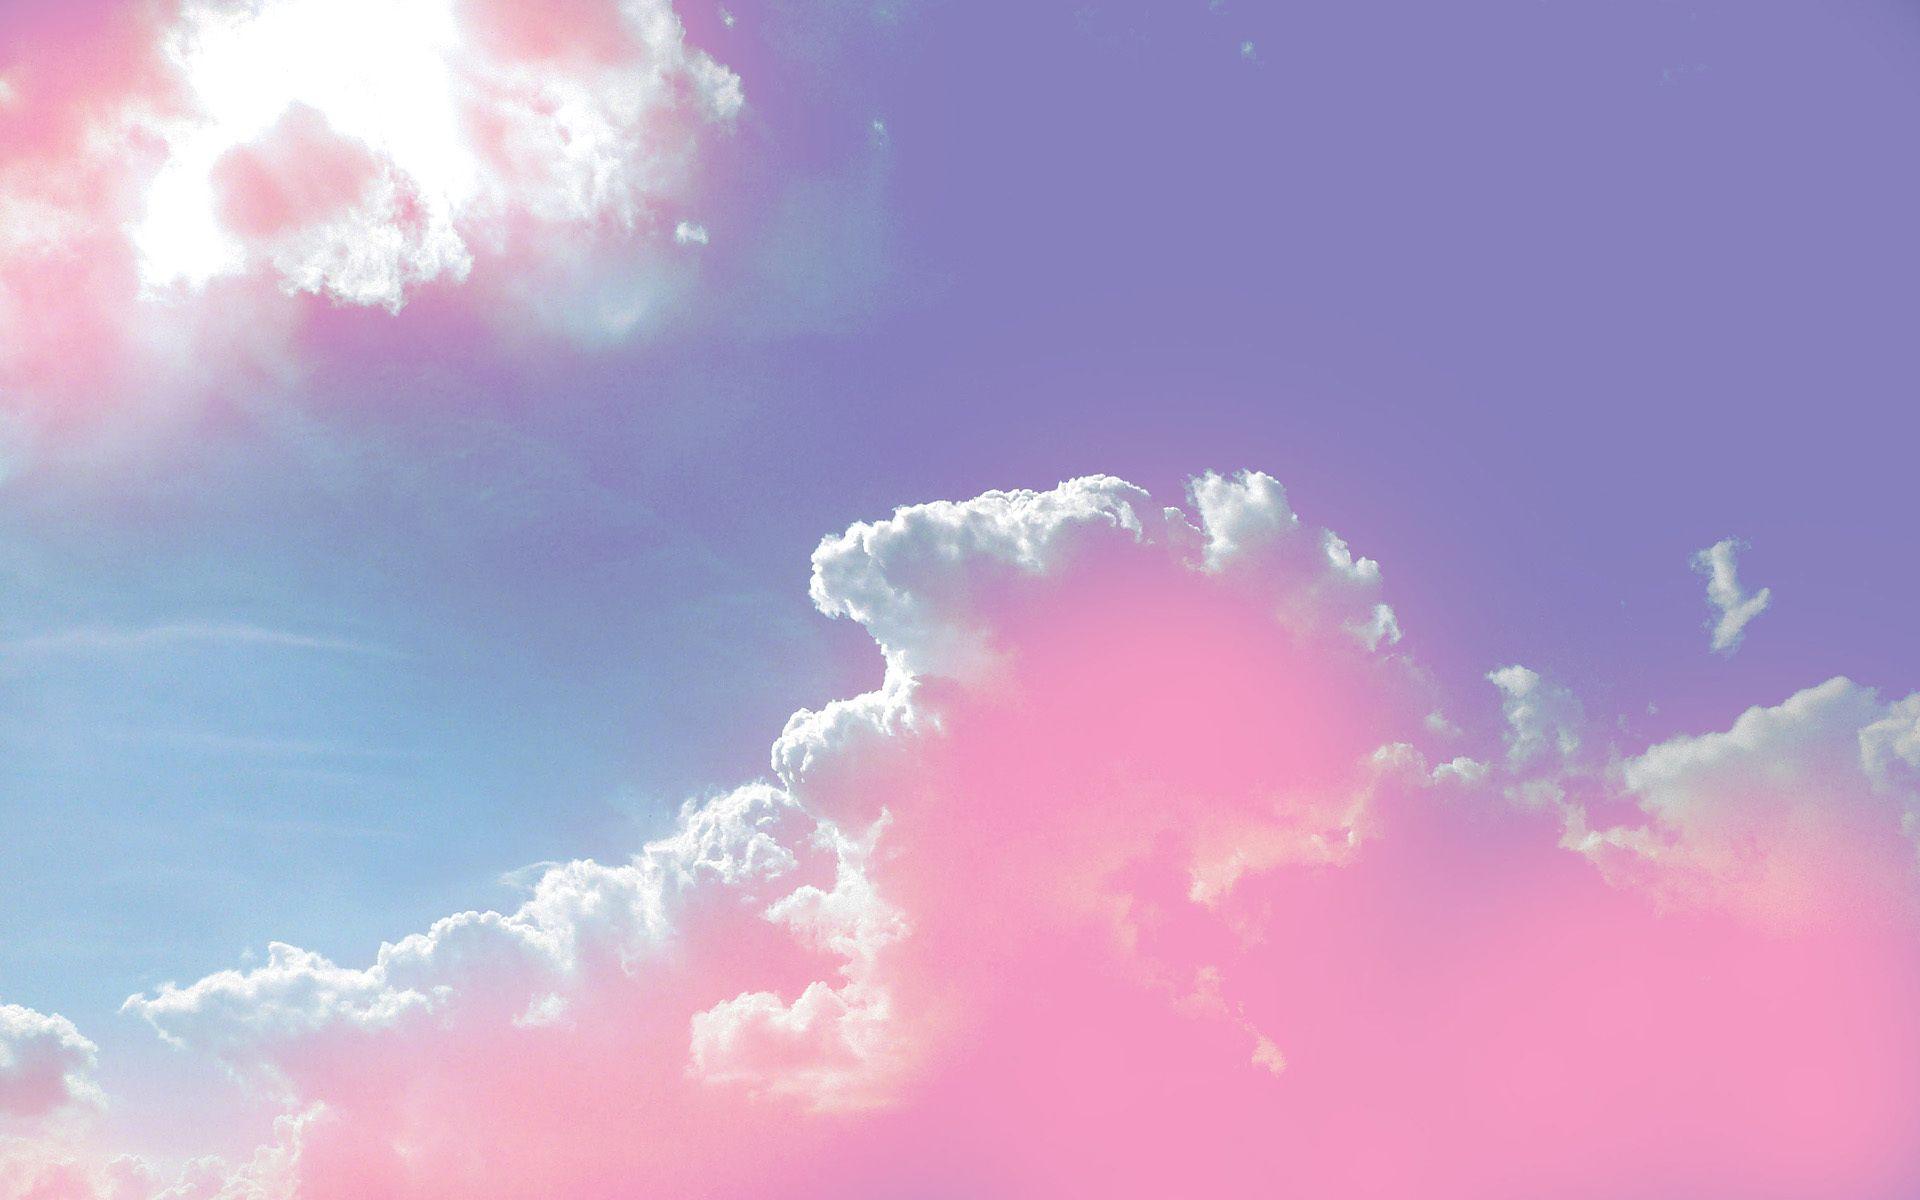 Desktop Sky Backgrounds Wallpapers, Backgrounds, Images